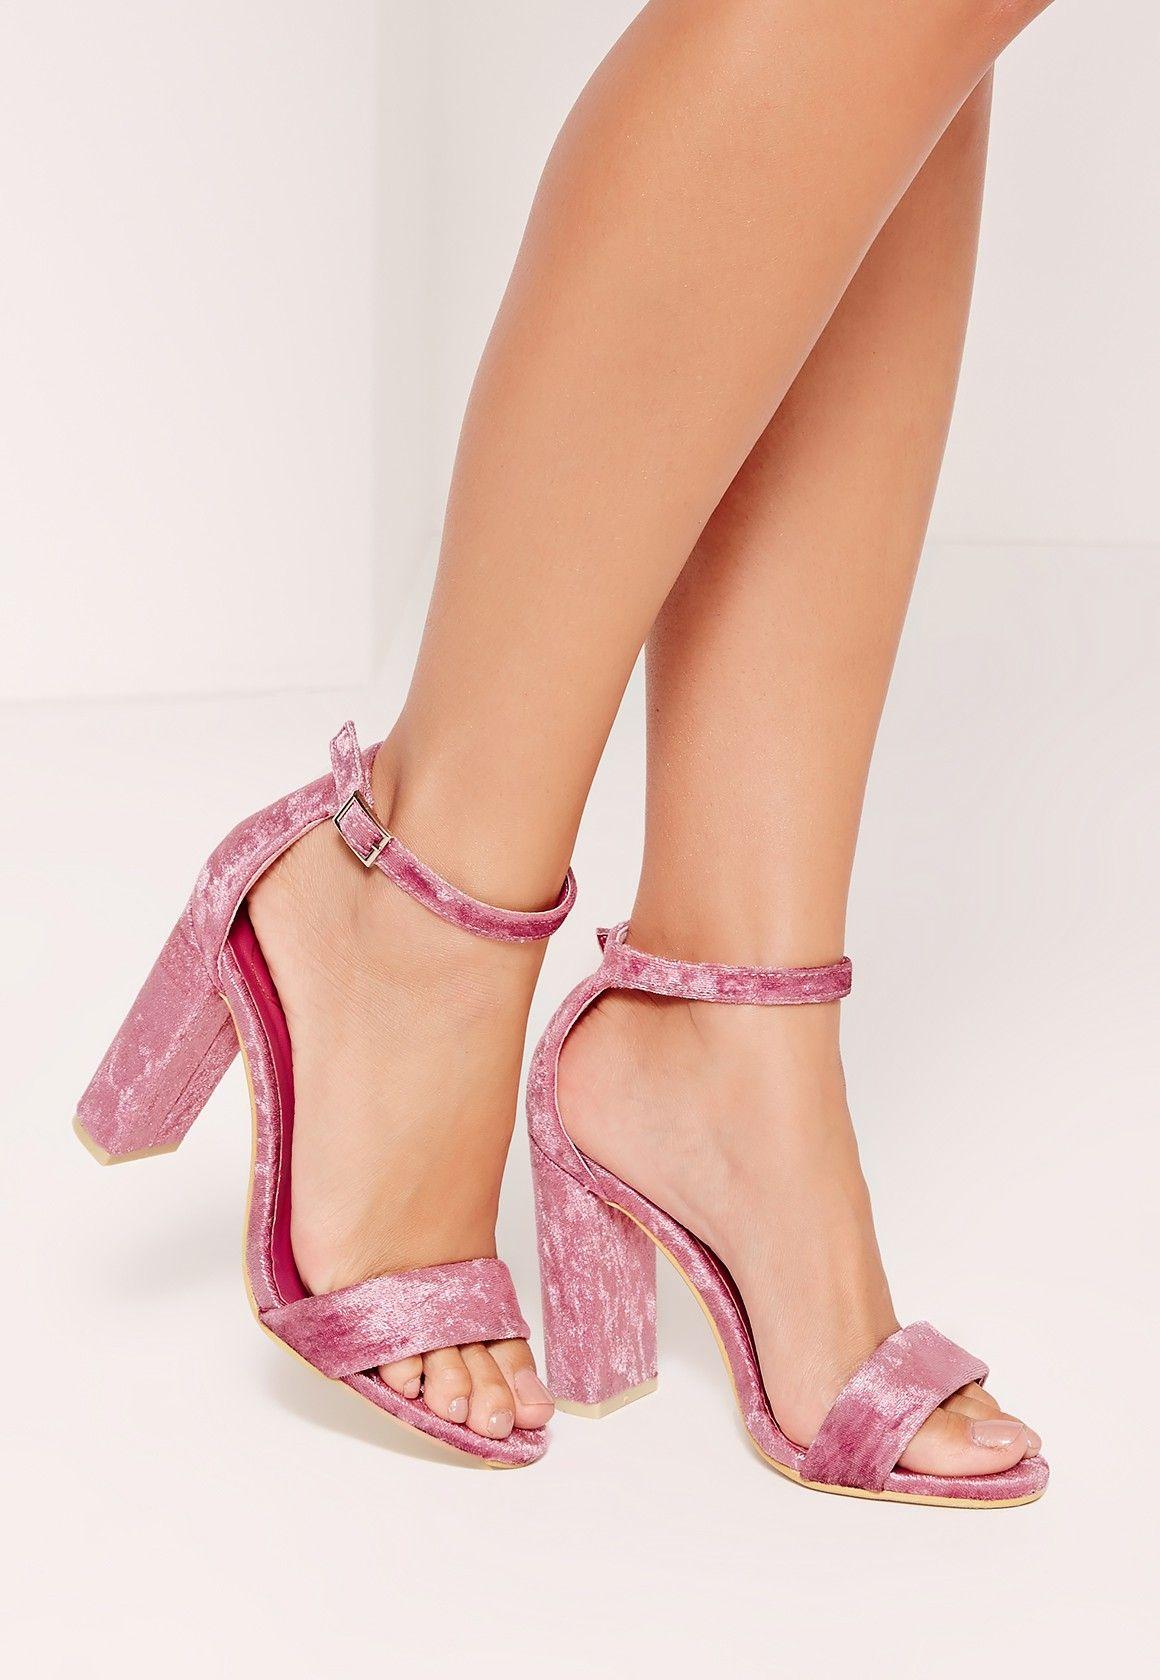 Missguided - Crushed Velvet Block Heeled Sandals Pink